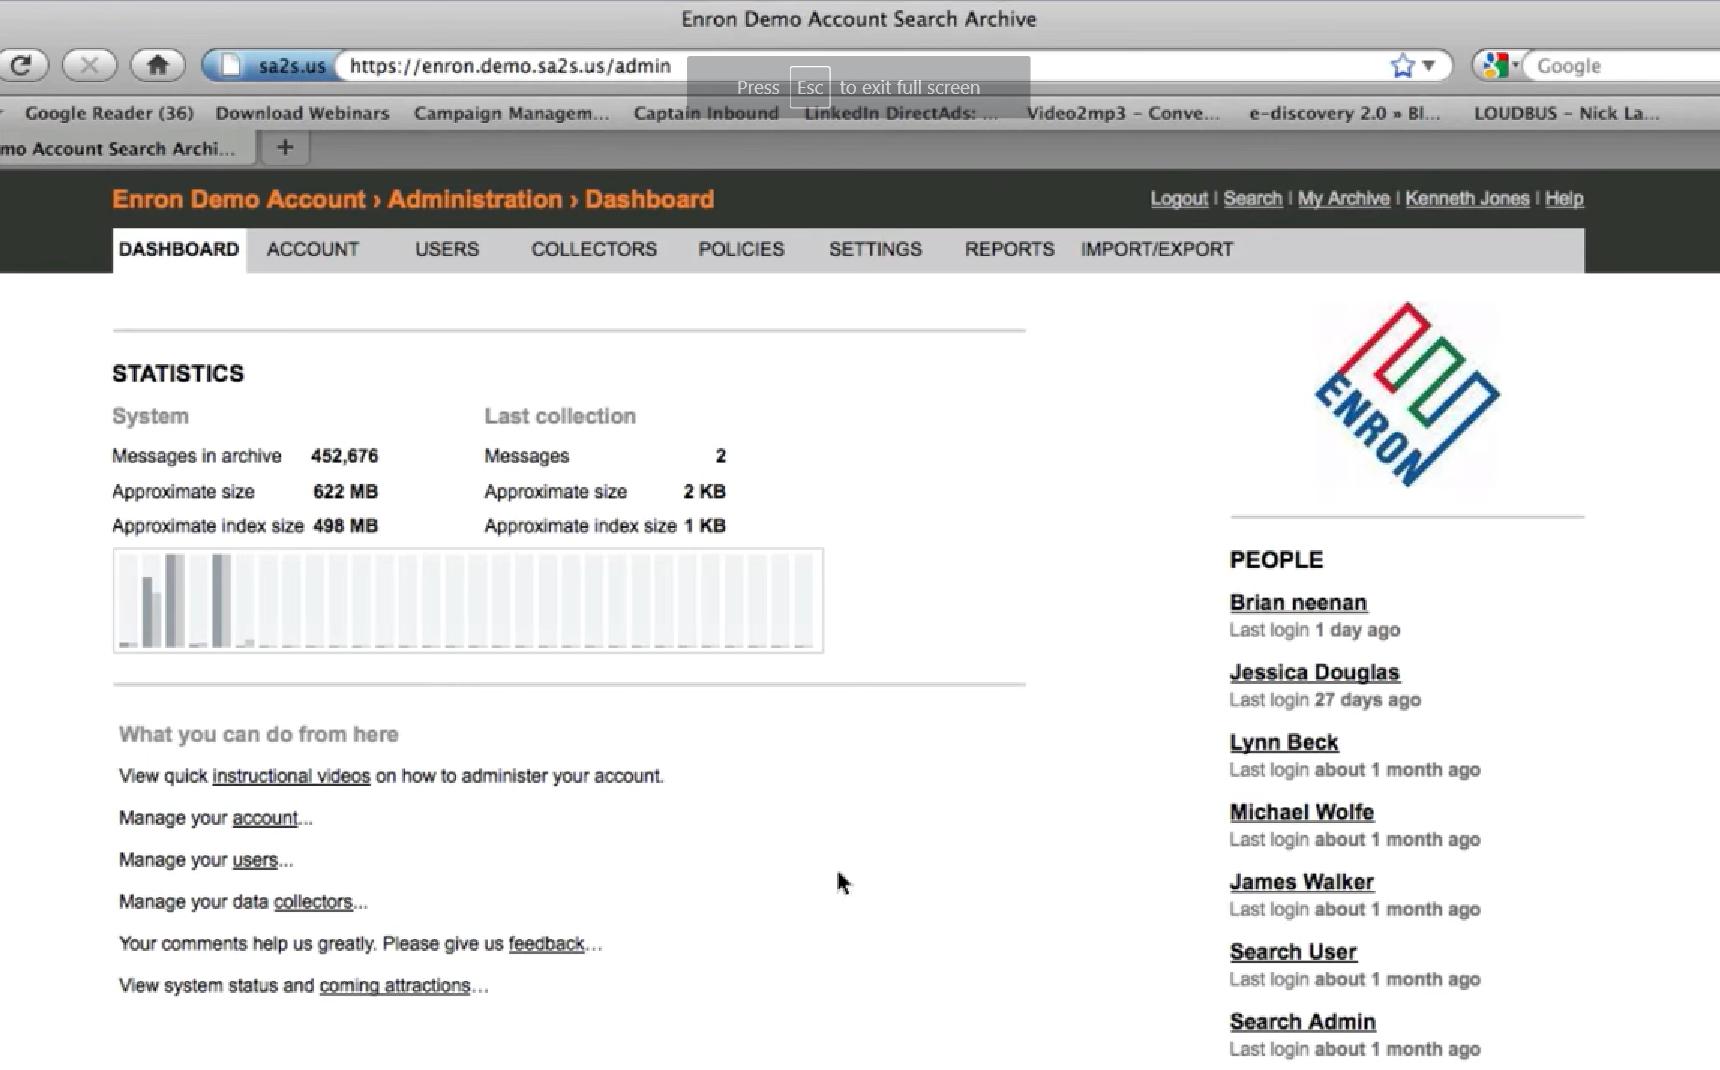 Sonain administrator dashboard for Enron demo account